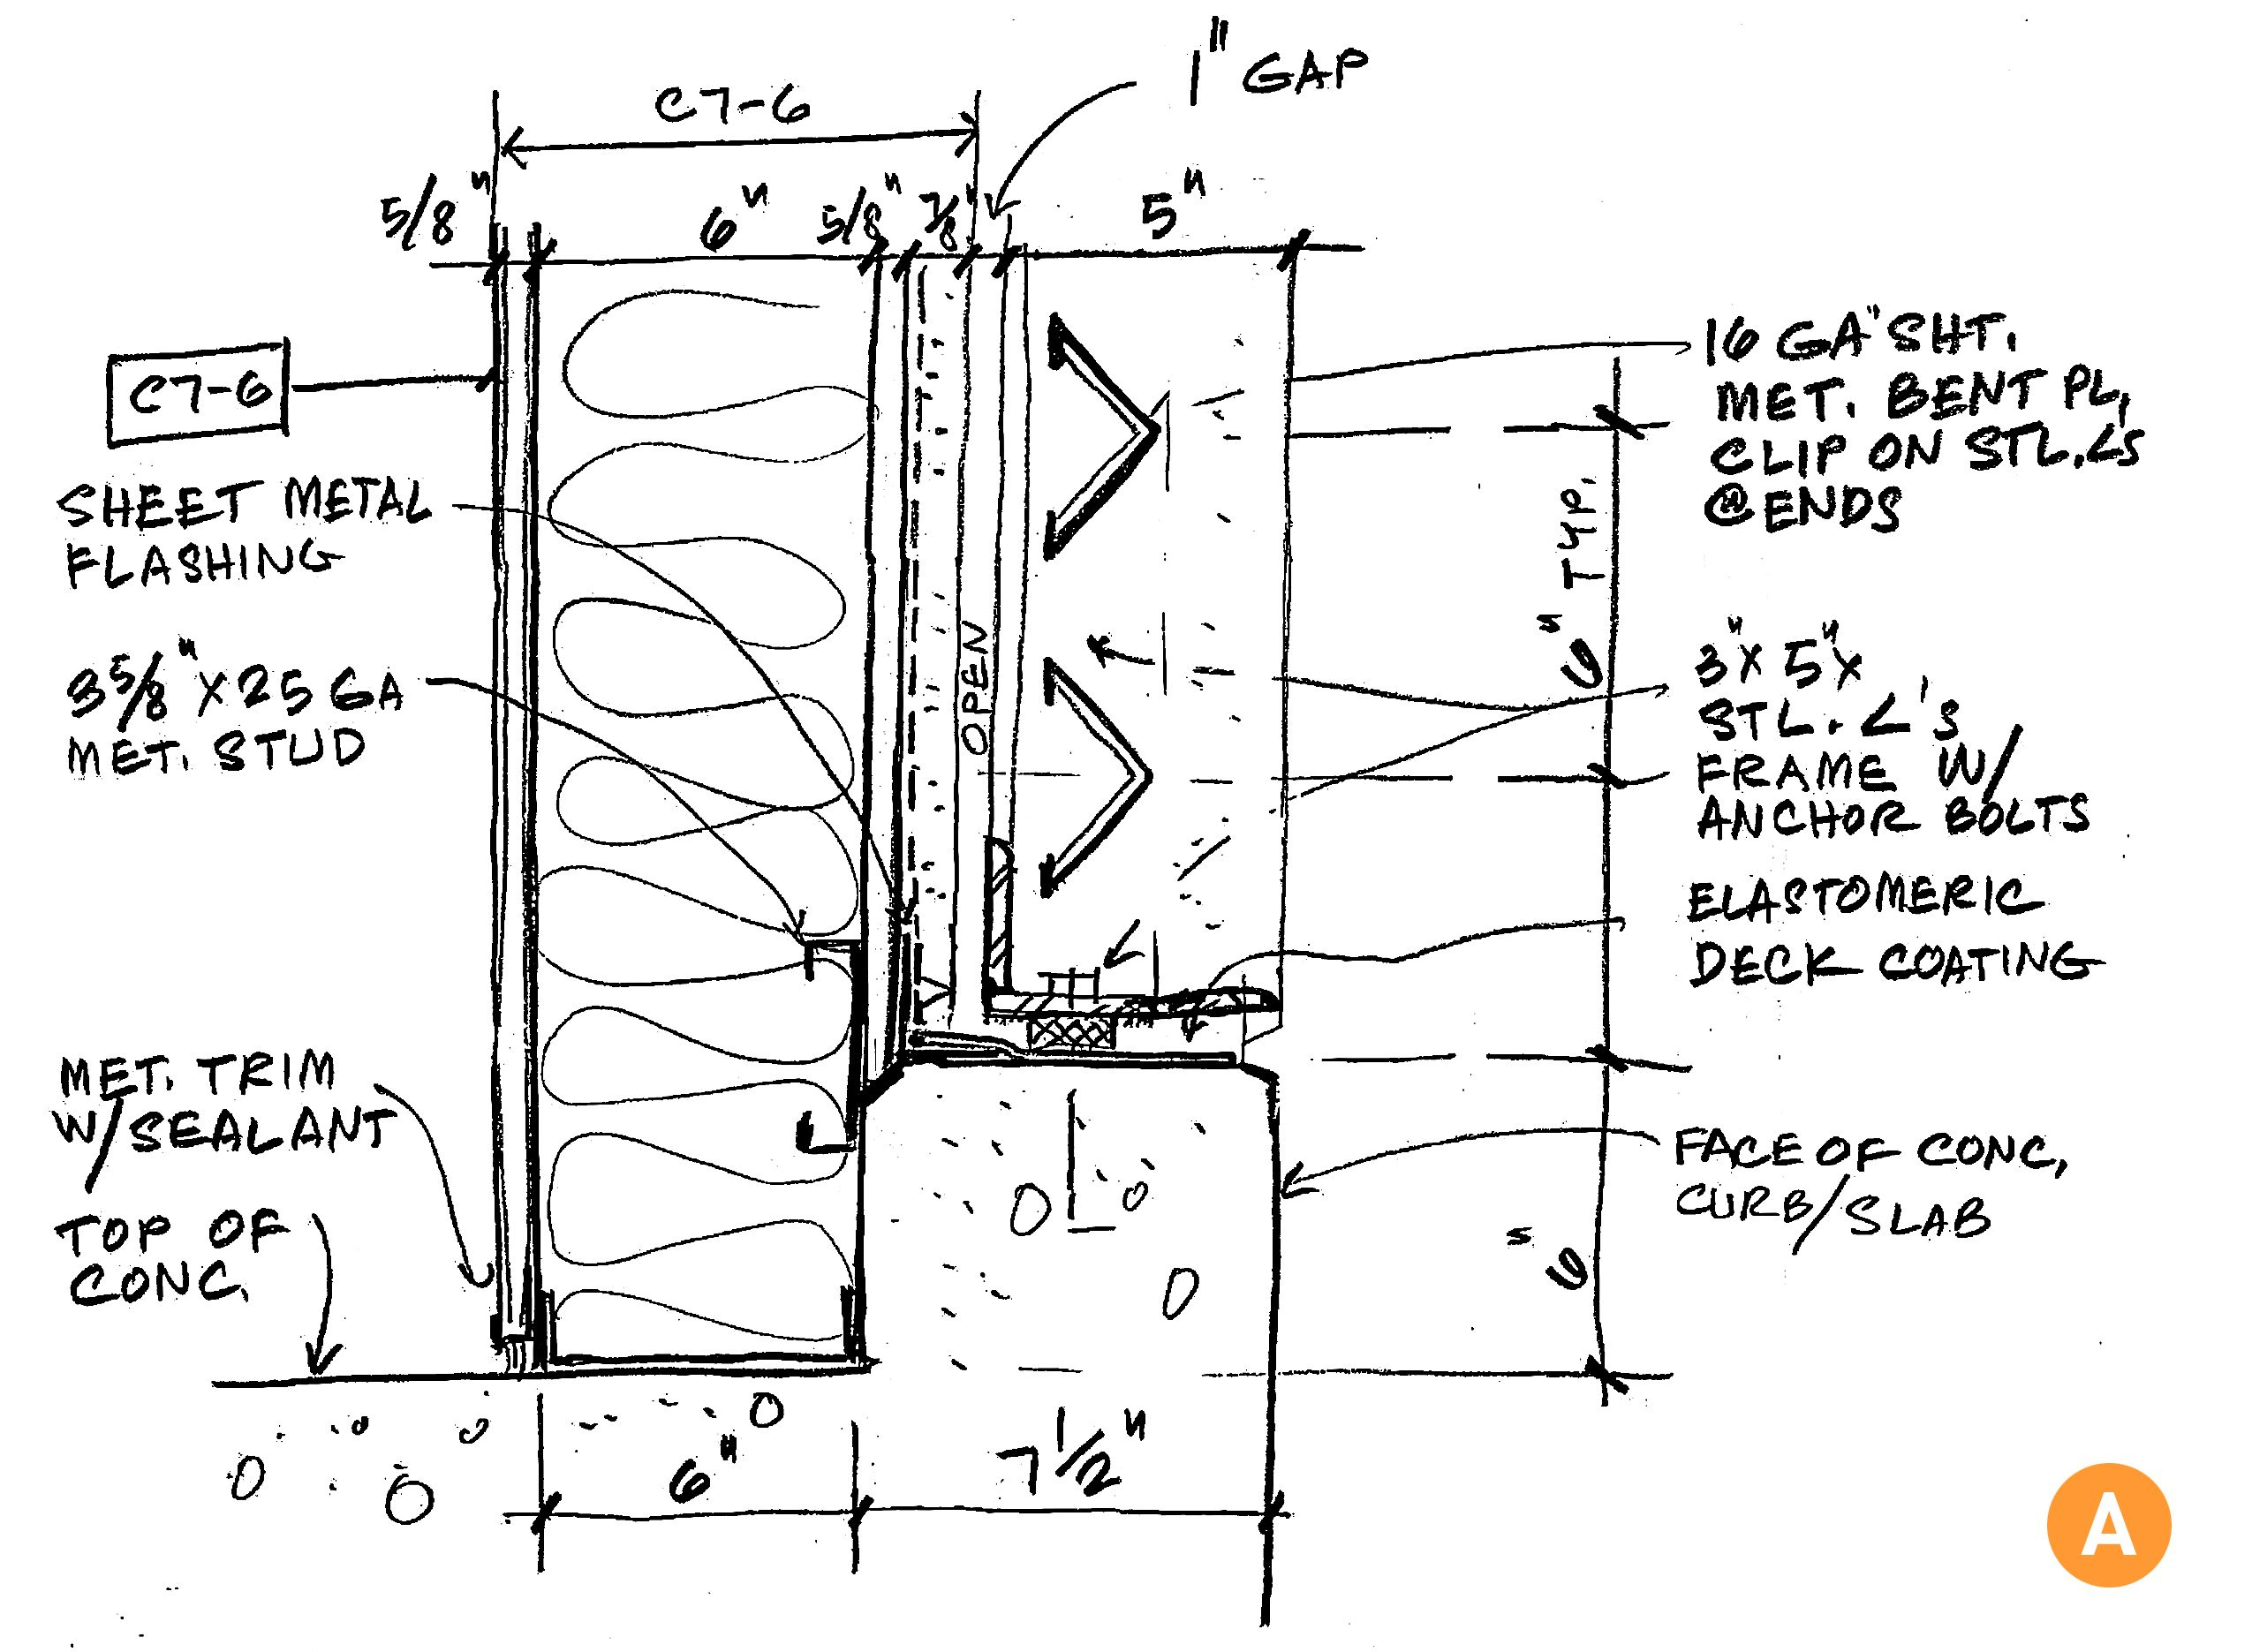 Construction Detail Sketch